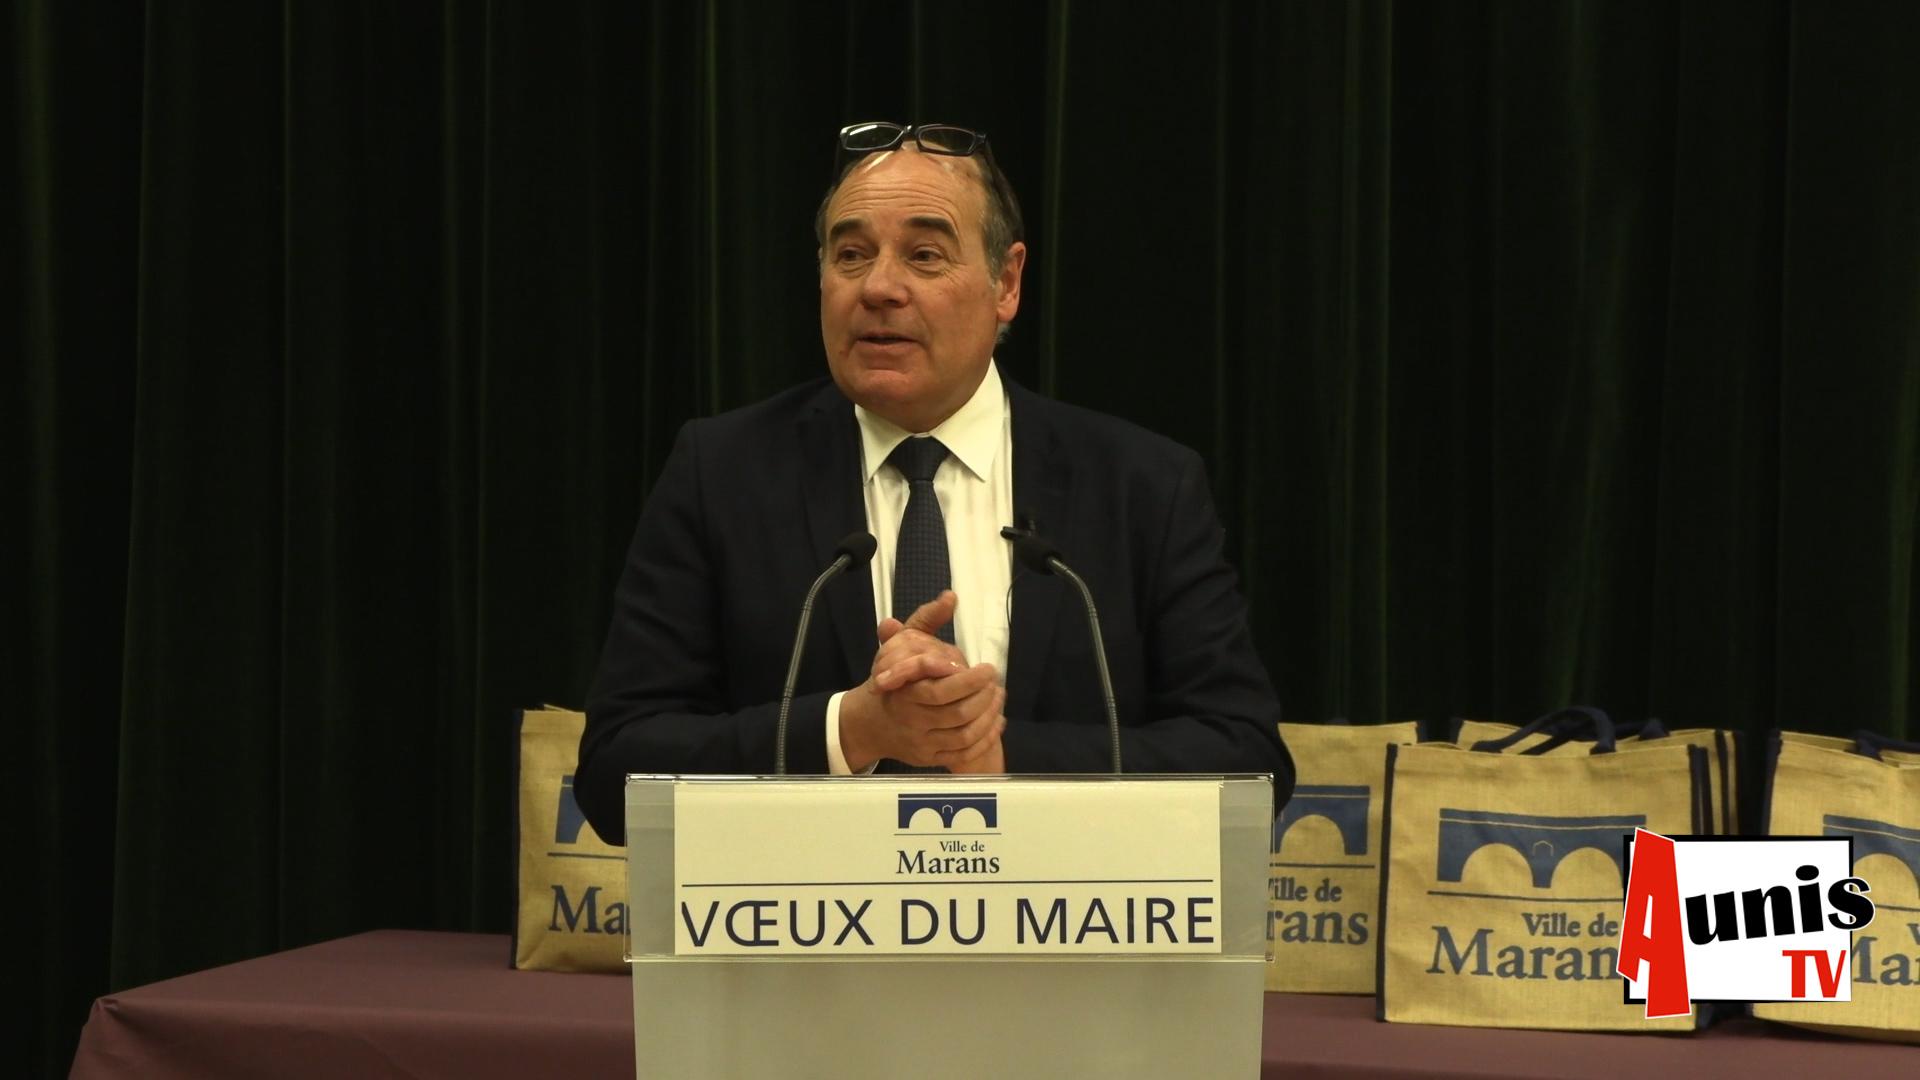 Voeux 2019 Marans Thierry Belhadj